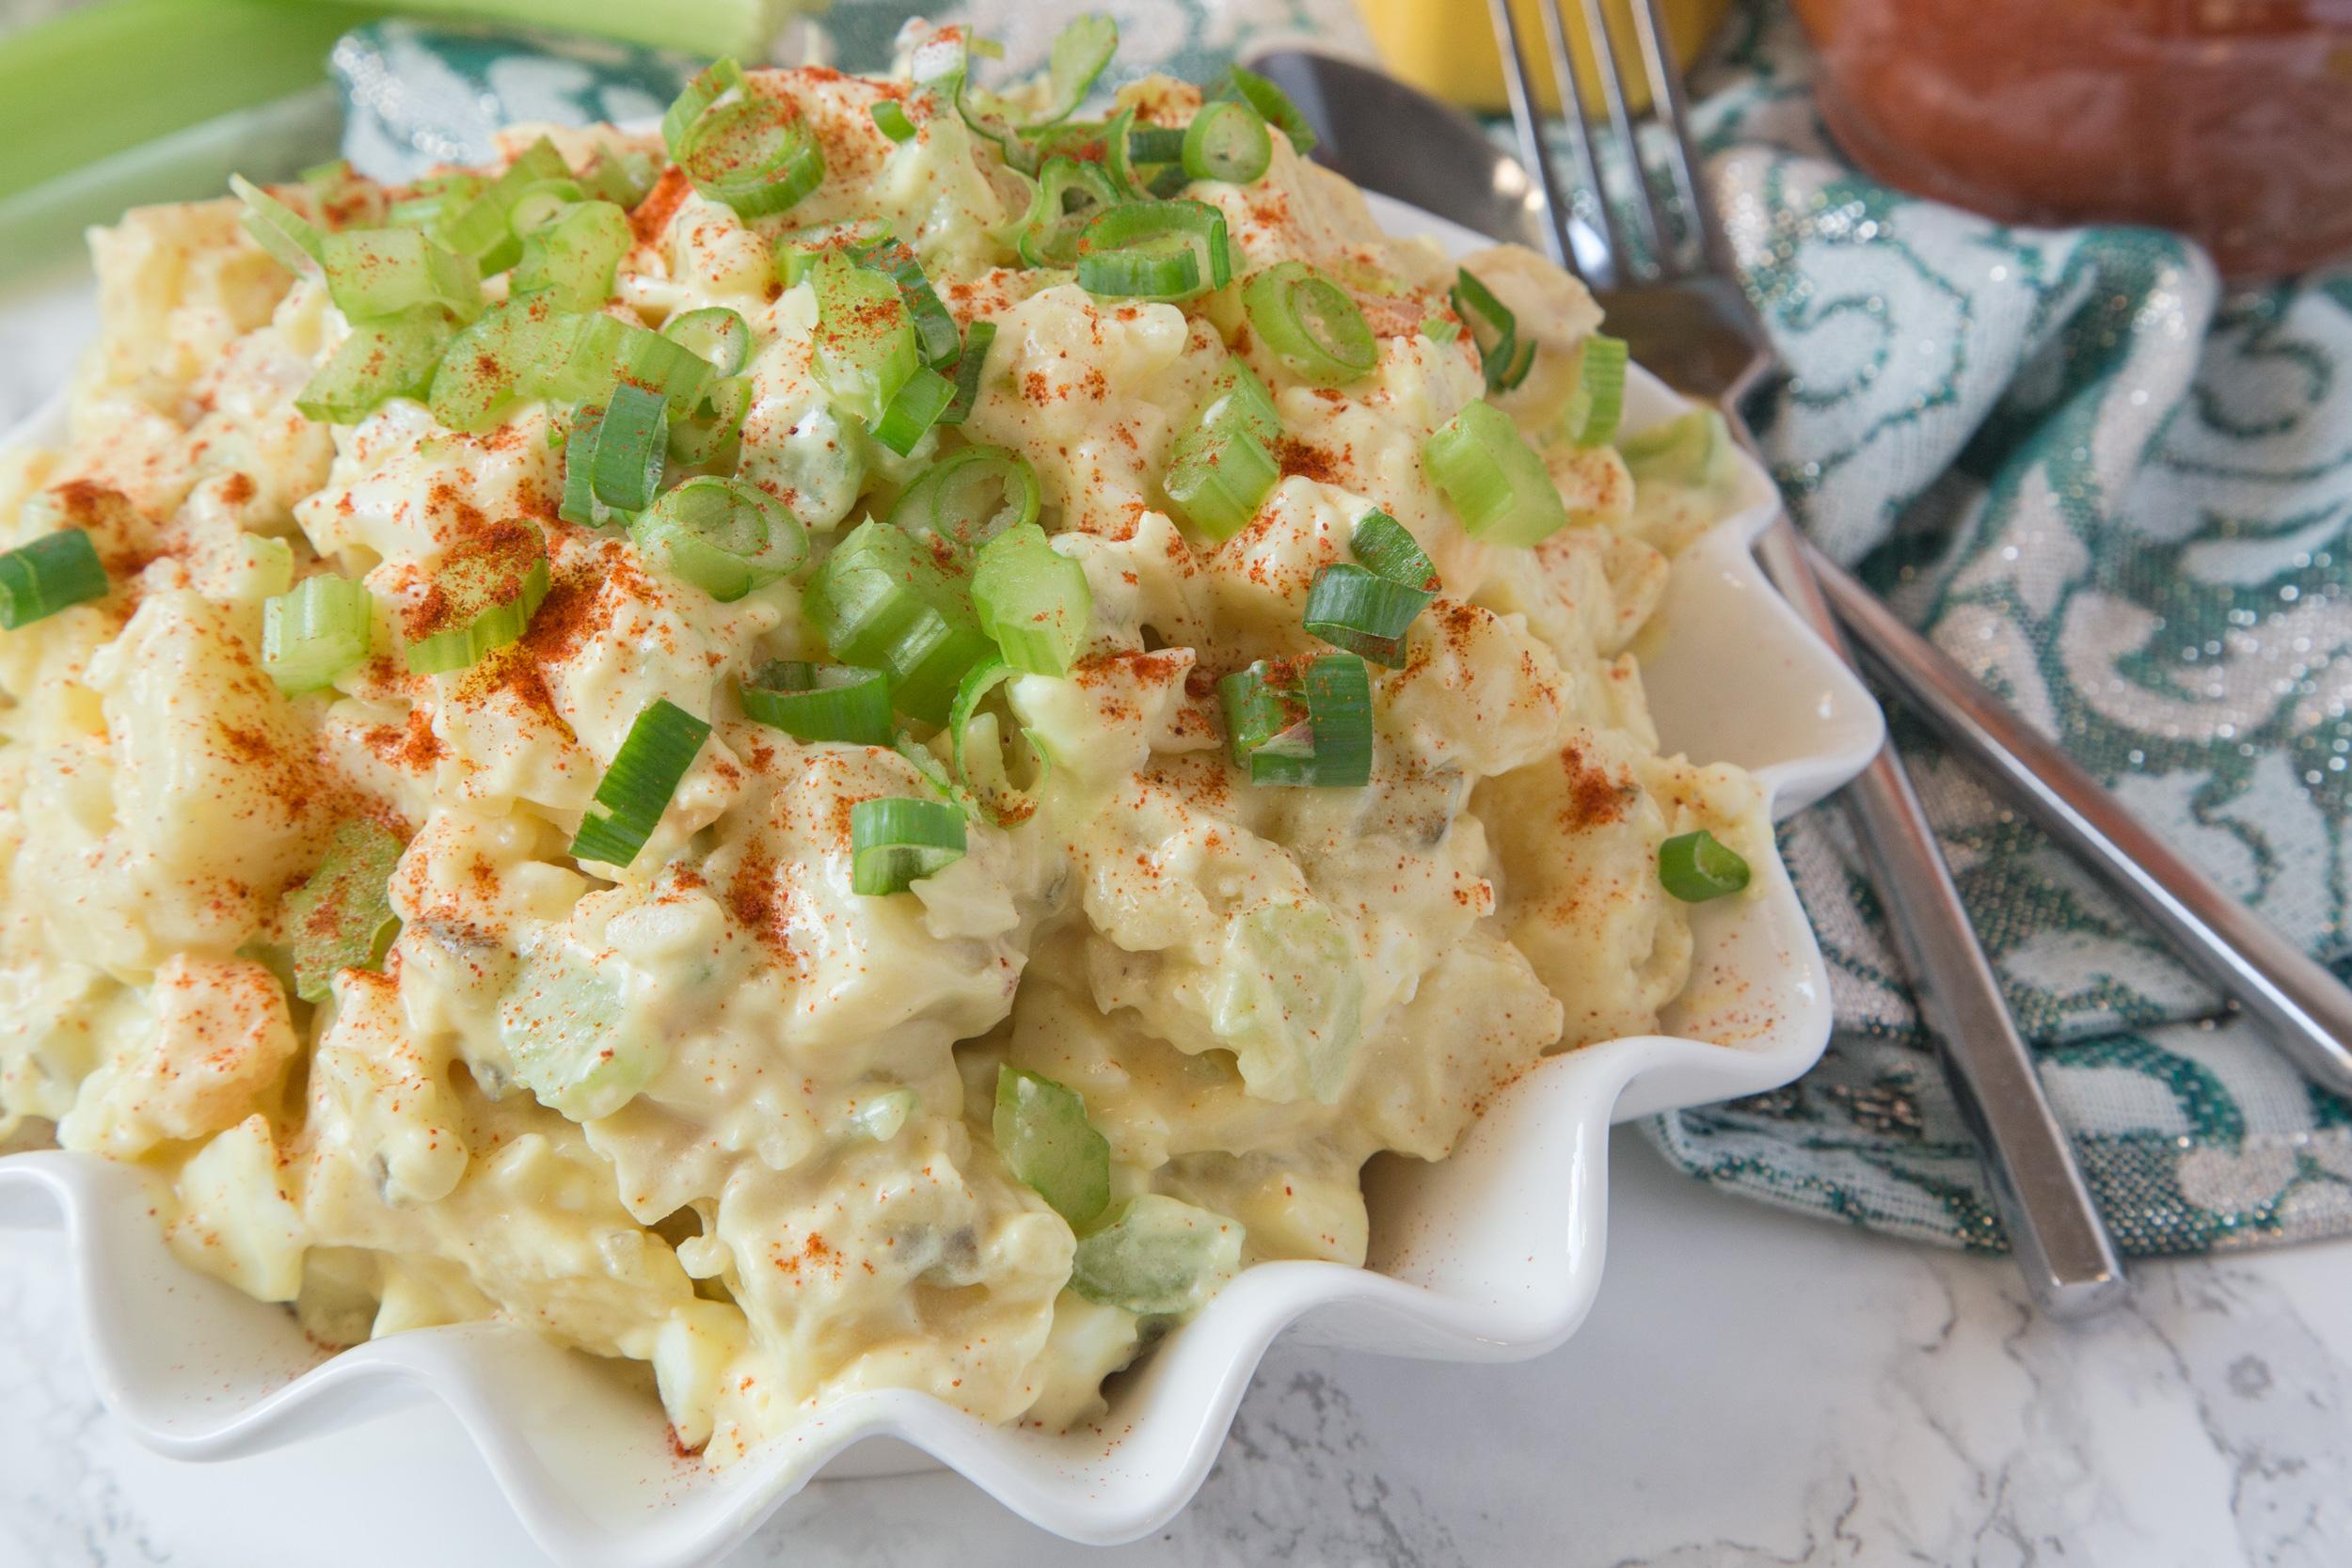 Nan's Classic Mustard Potato Salad